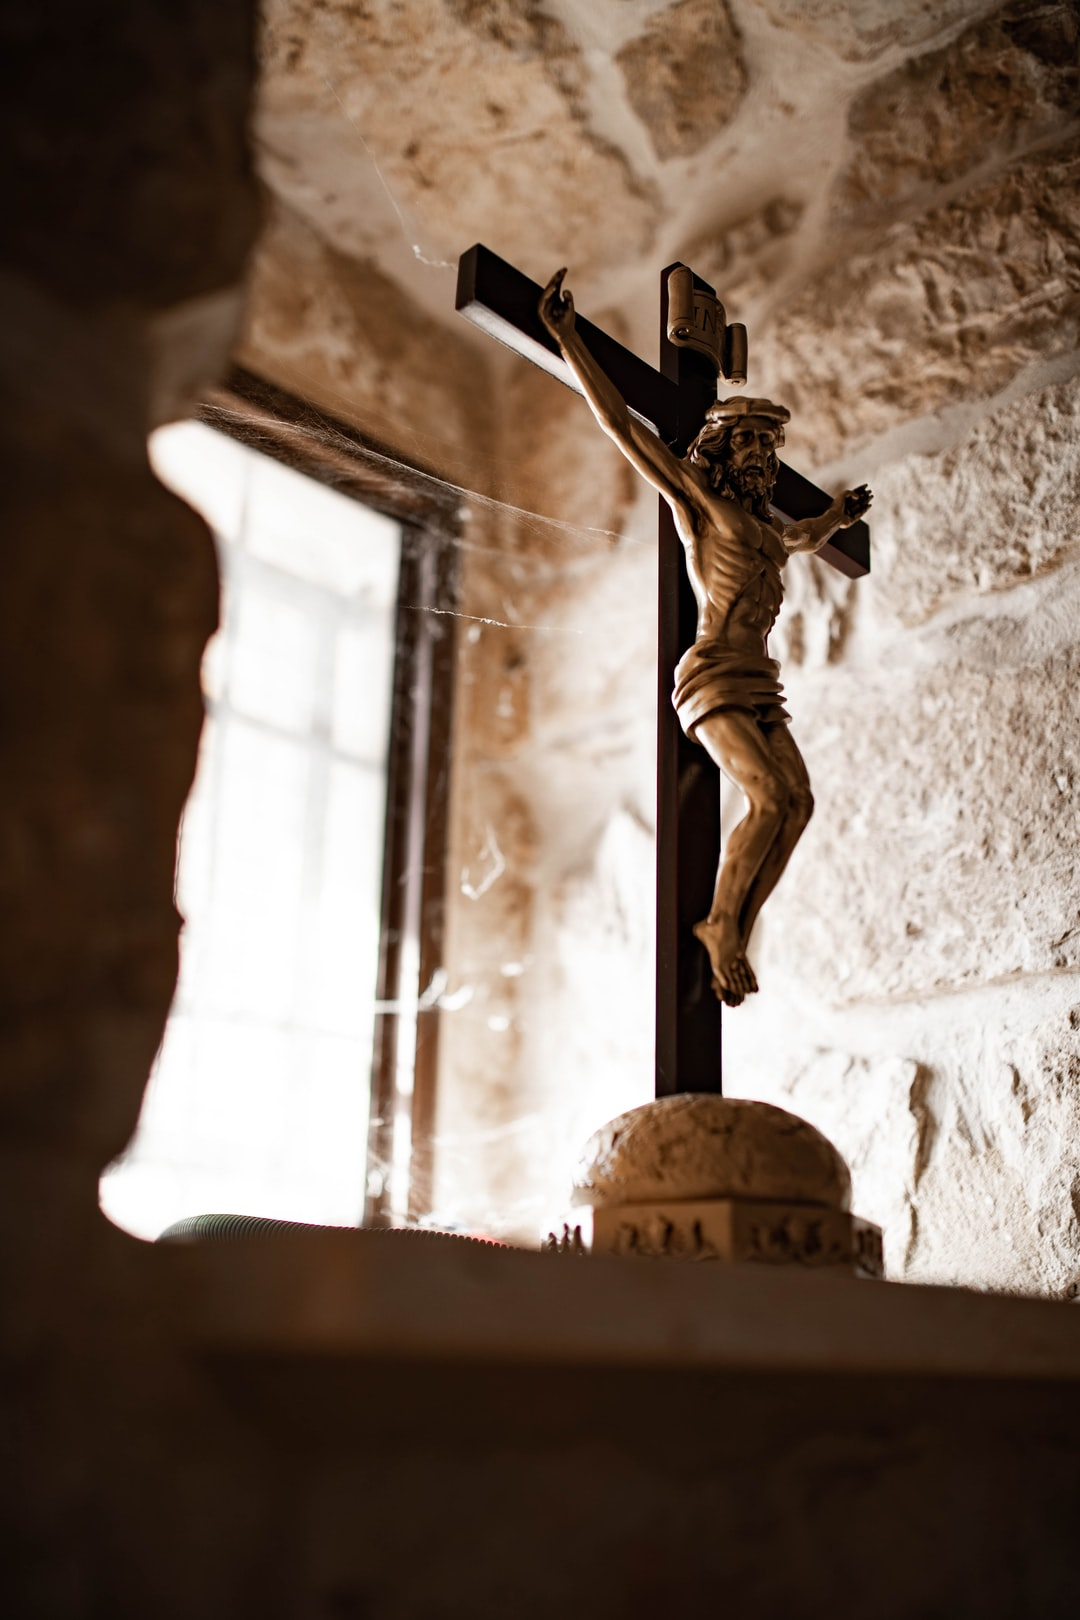 Here is a crucifix I photographer while visiting a Maronite Church in Baram National Park - near Jish, Israel